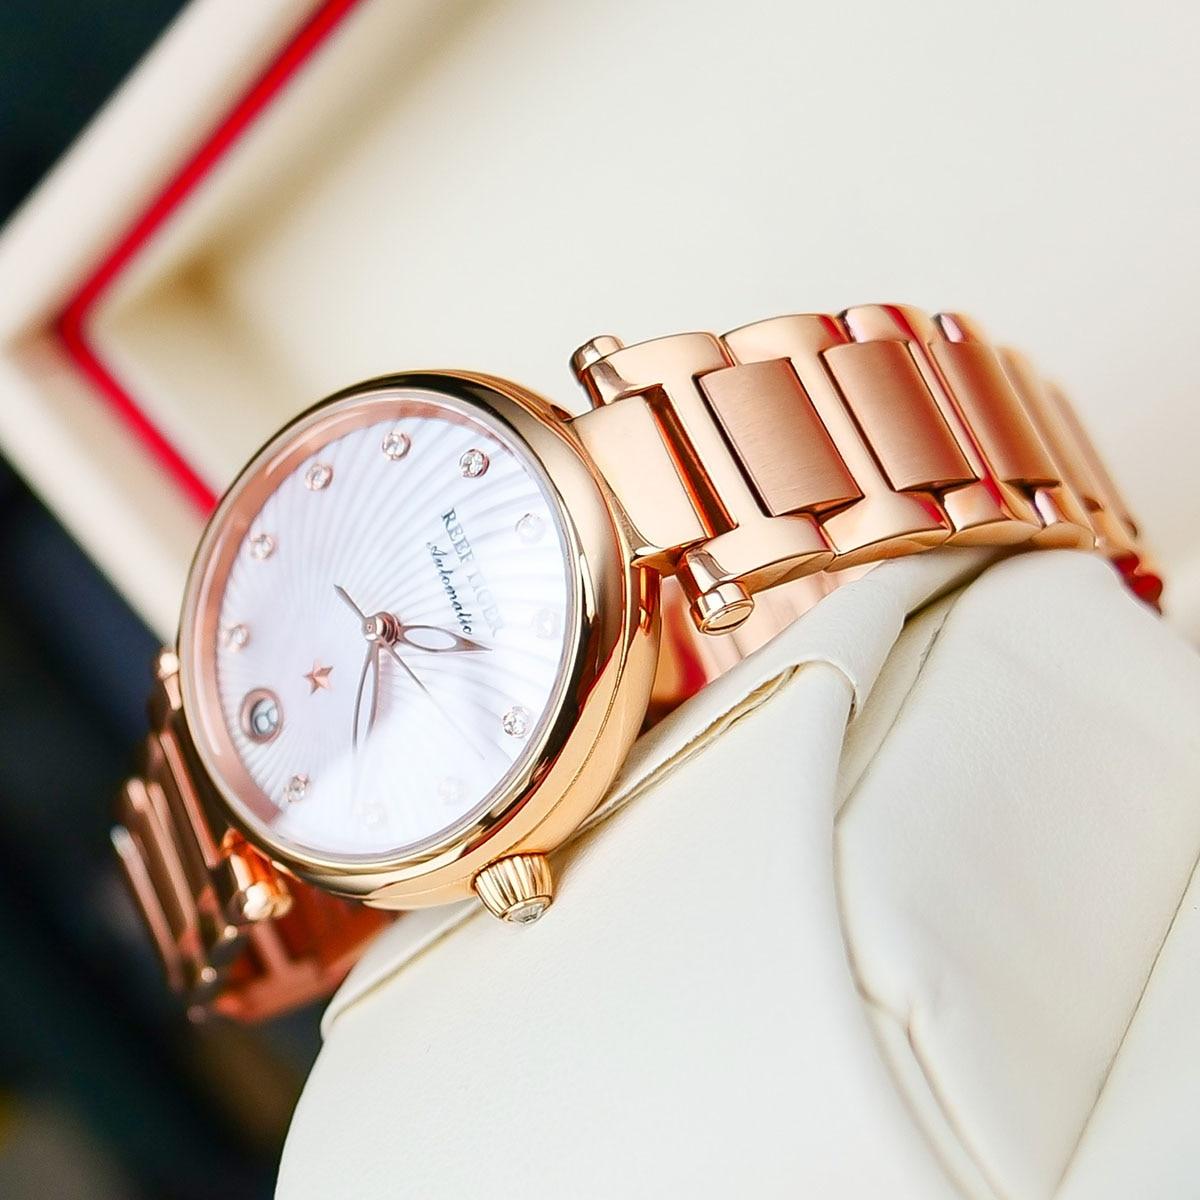 Reef Tiger/RT Luxury Watch Ladies Rose Gold Diamond Bracelet Watches Date Women Pink Watches Relogio Feminino Gift RGA1590 enlarge